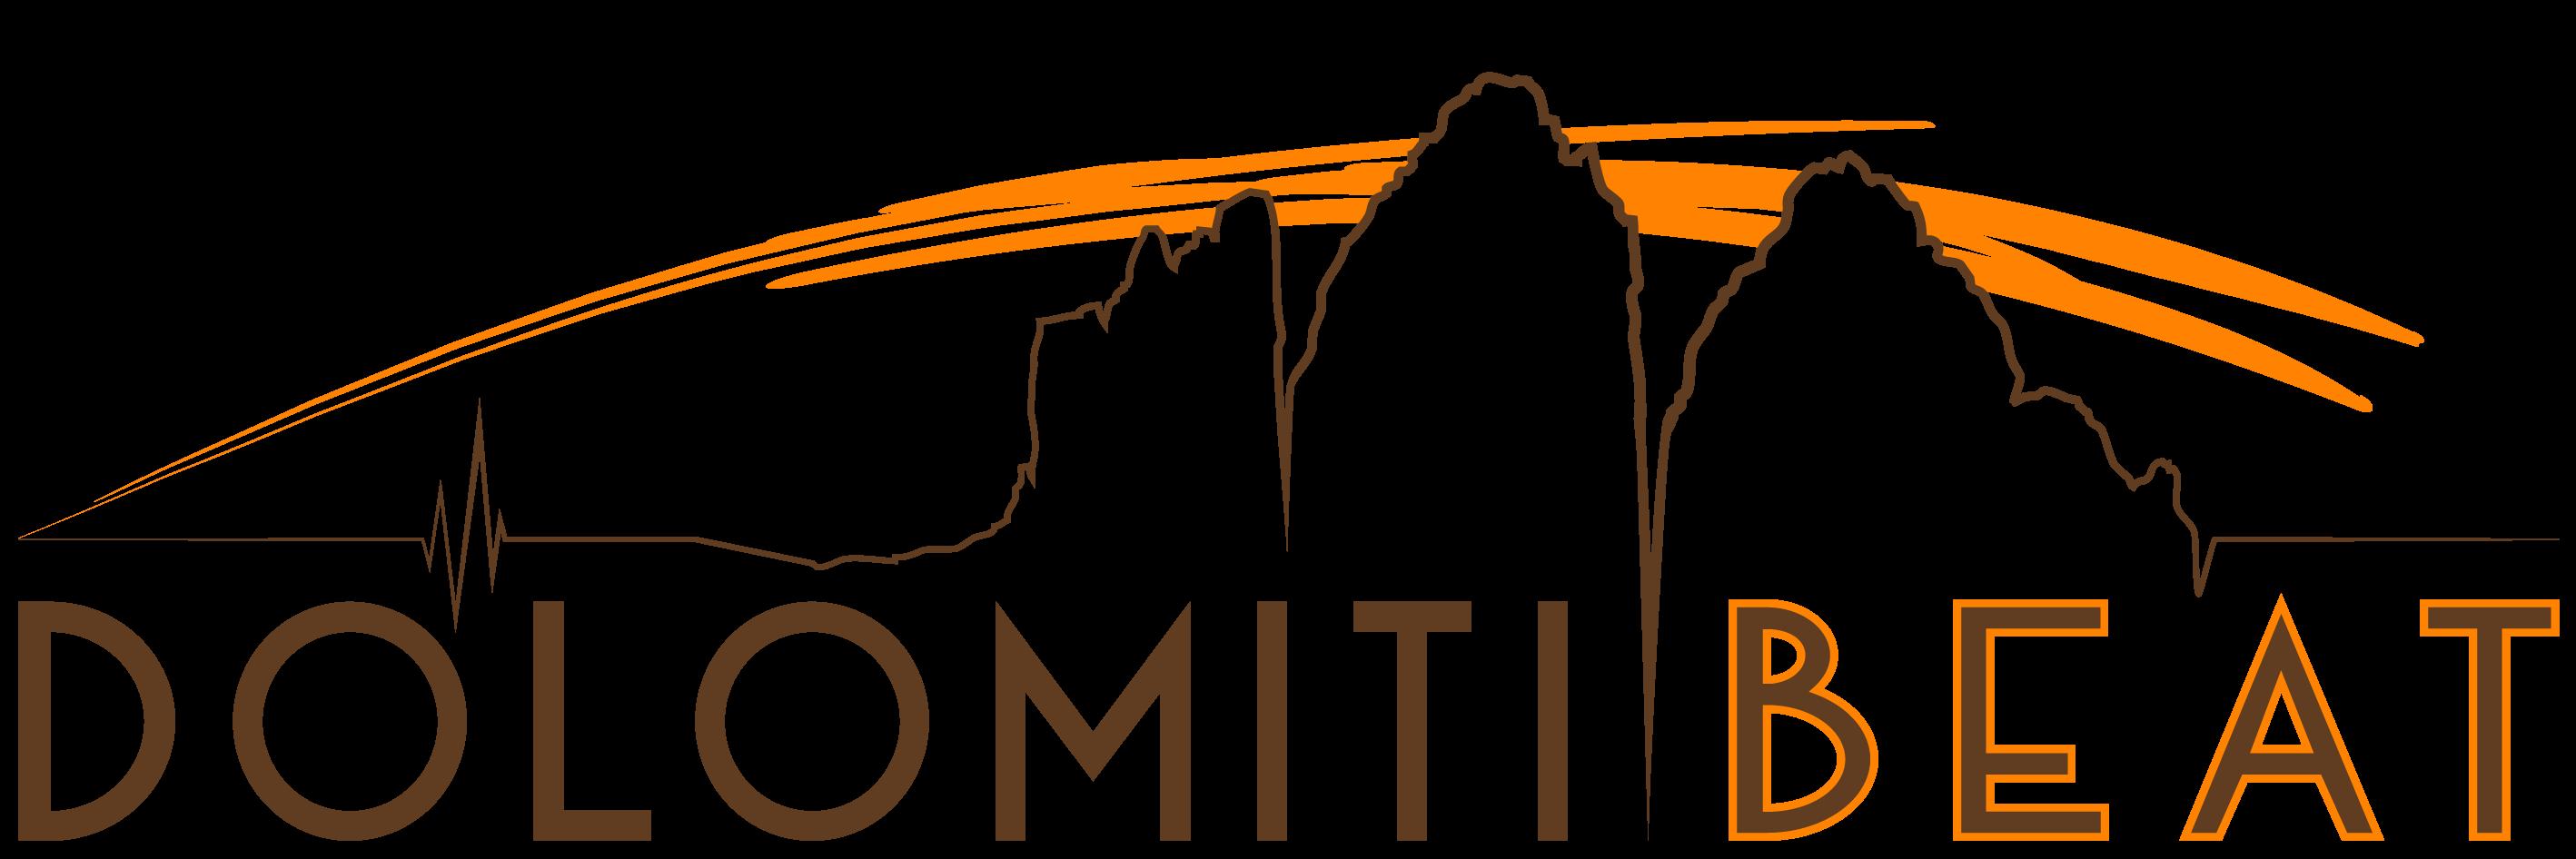 logo Dolomiti Beat